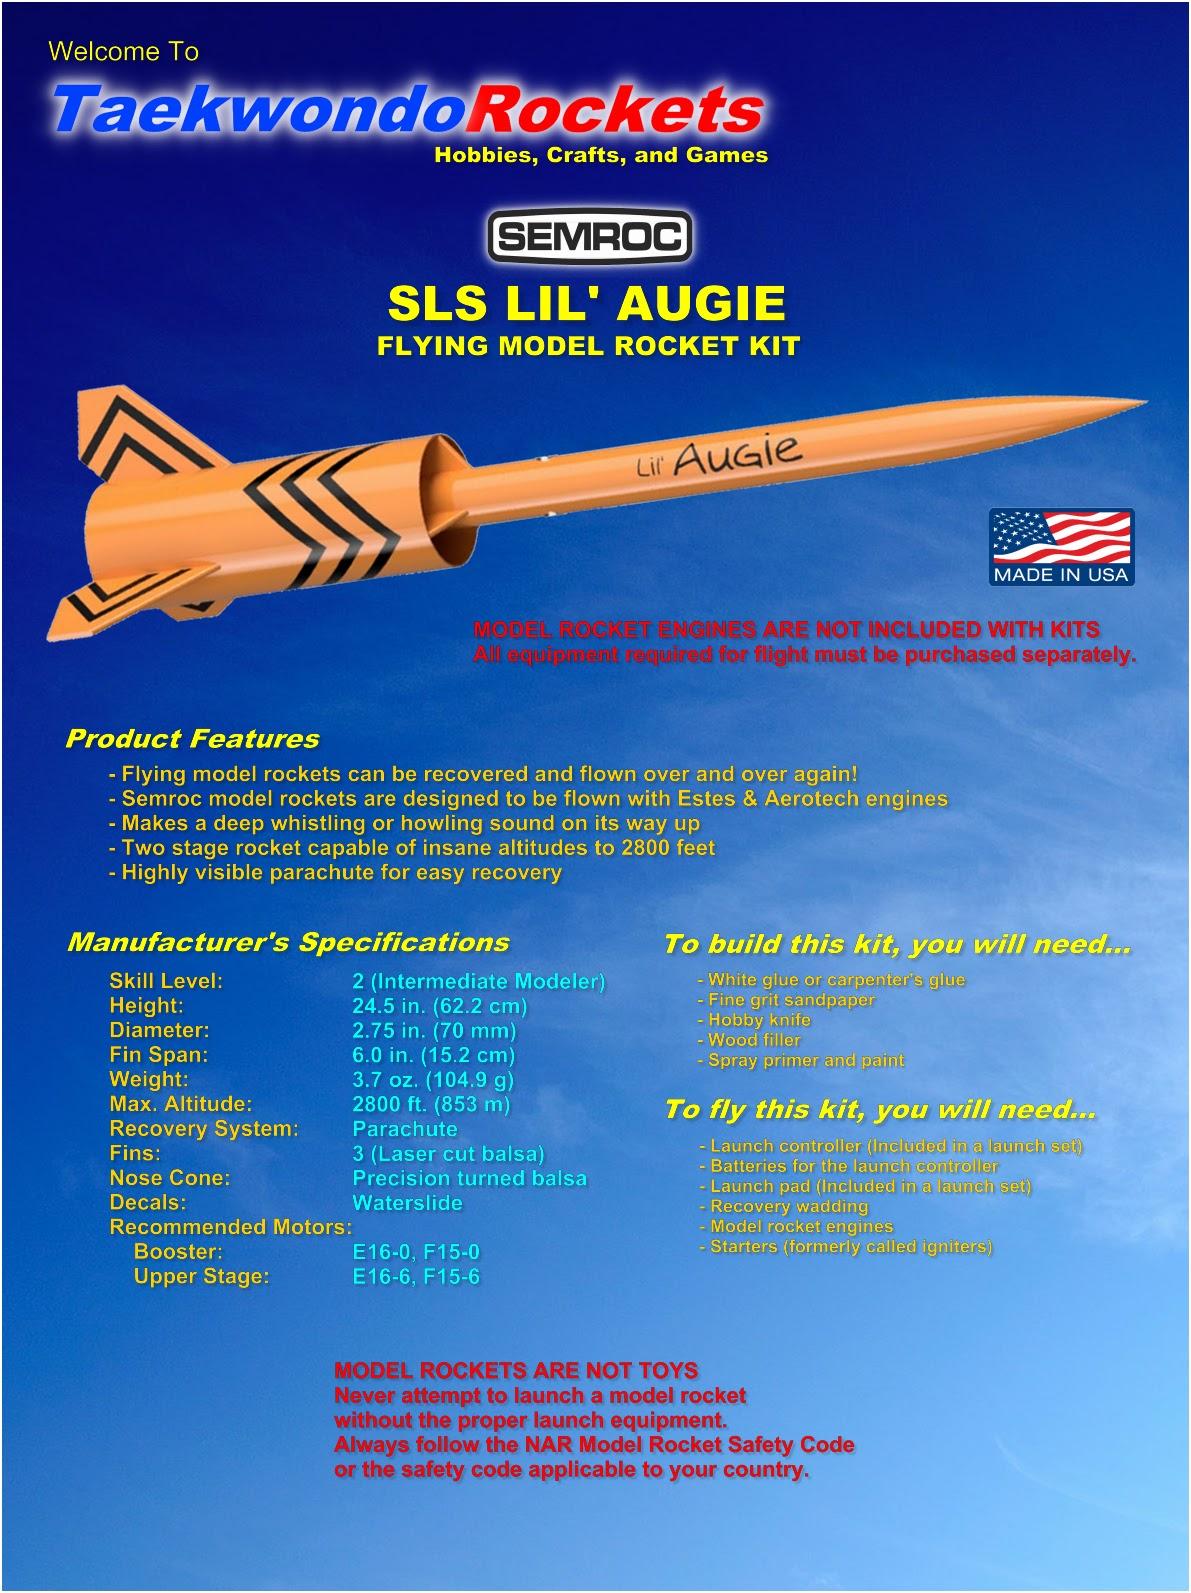 SEMROC SLS LIL' AUGIE Flying Model Rocket Kit - KA-38